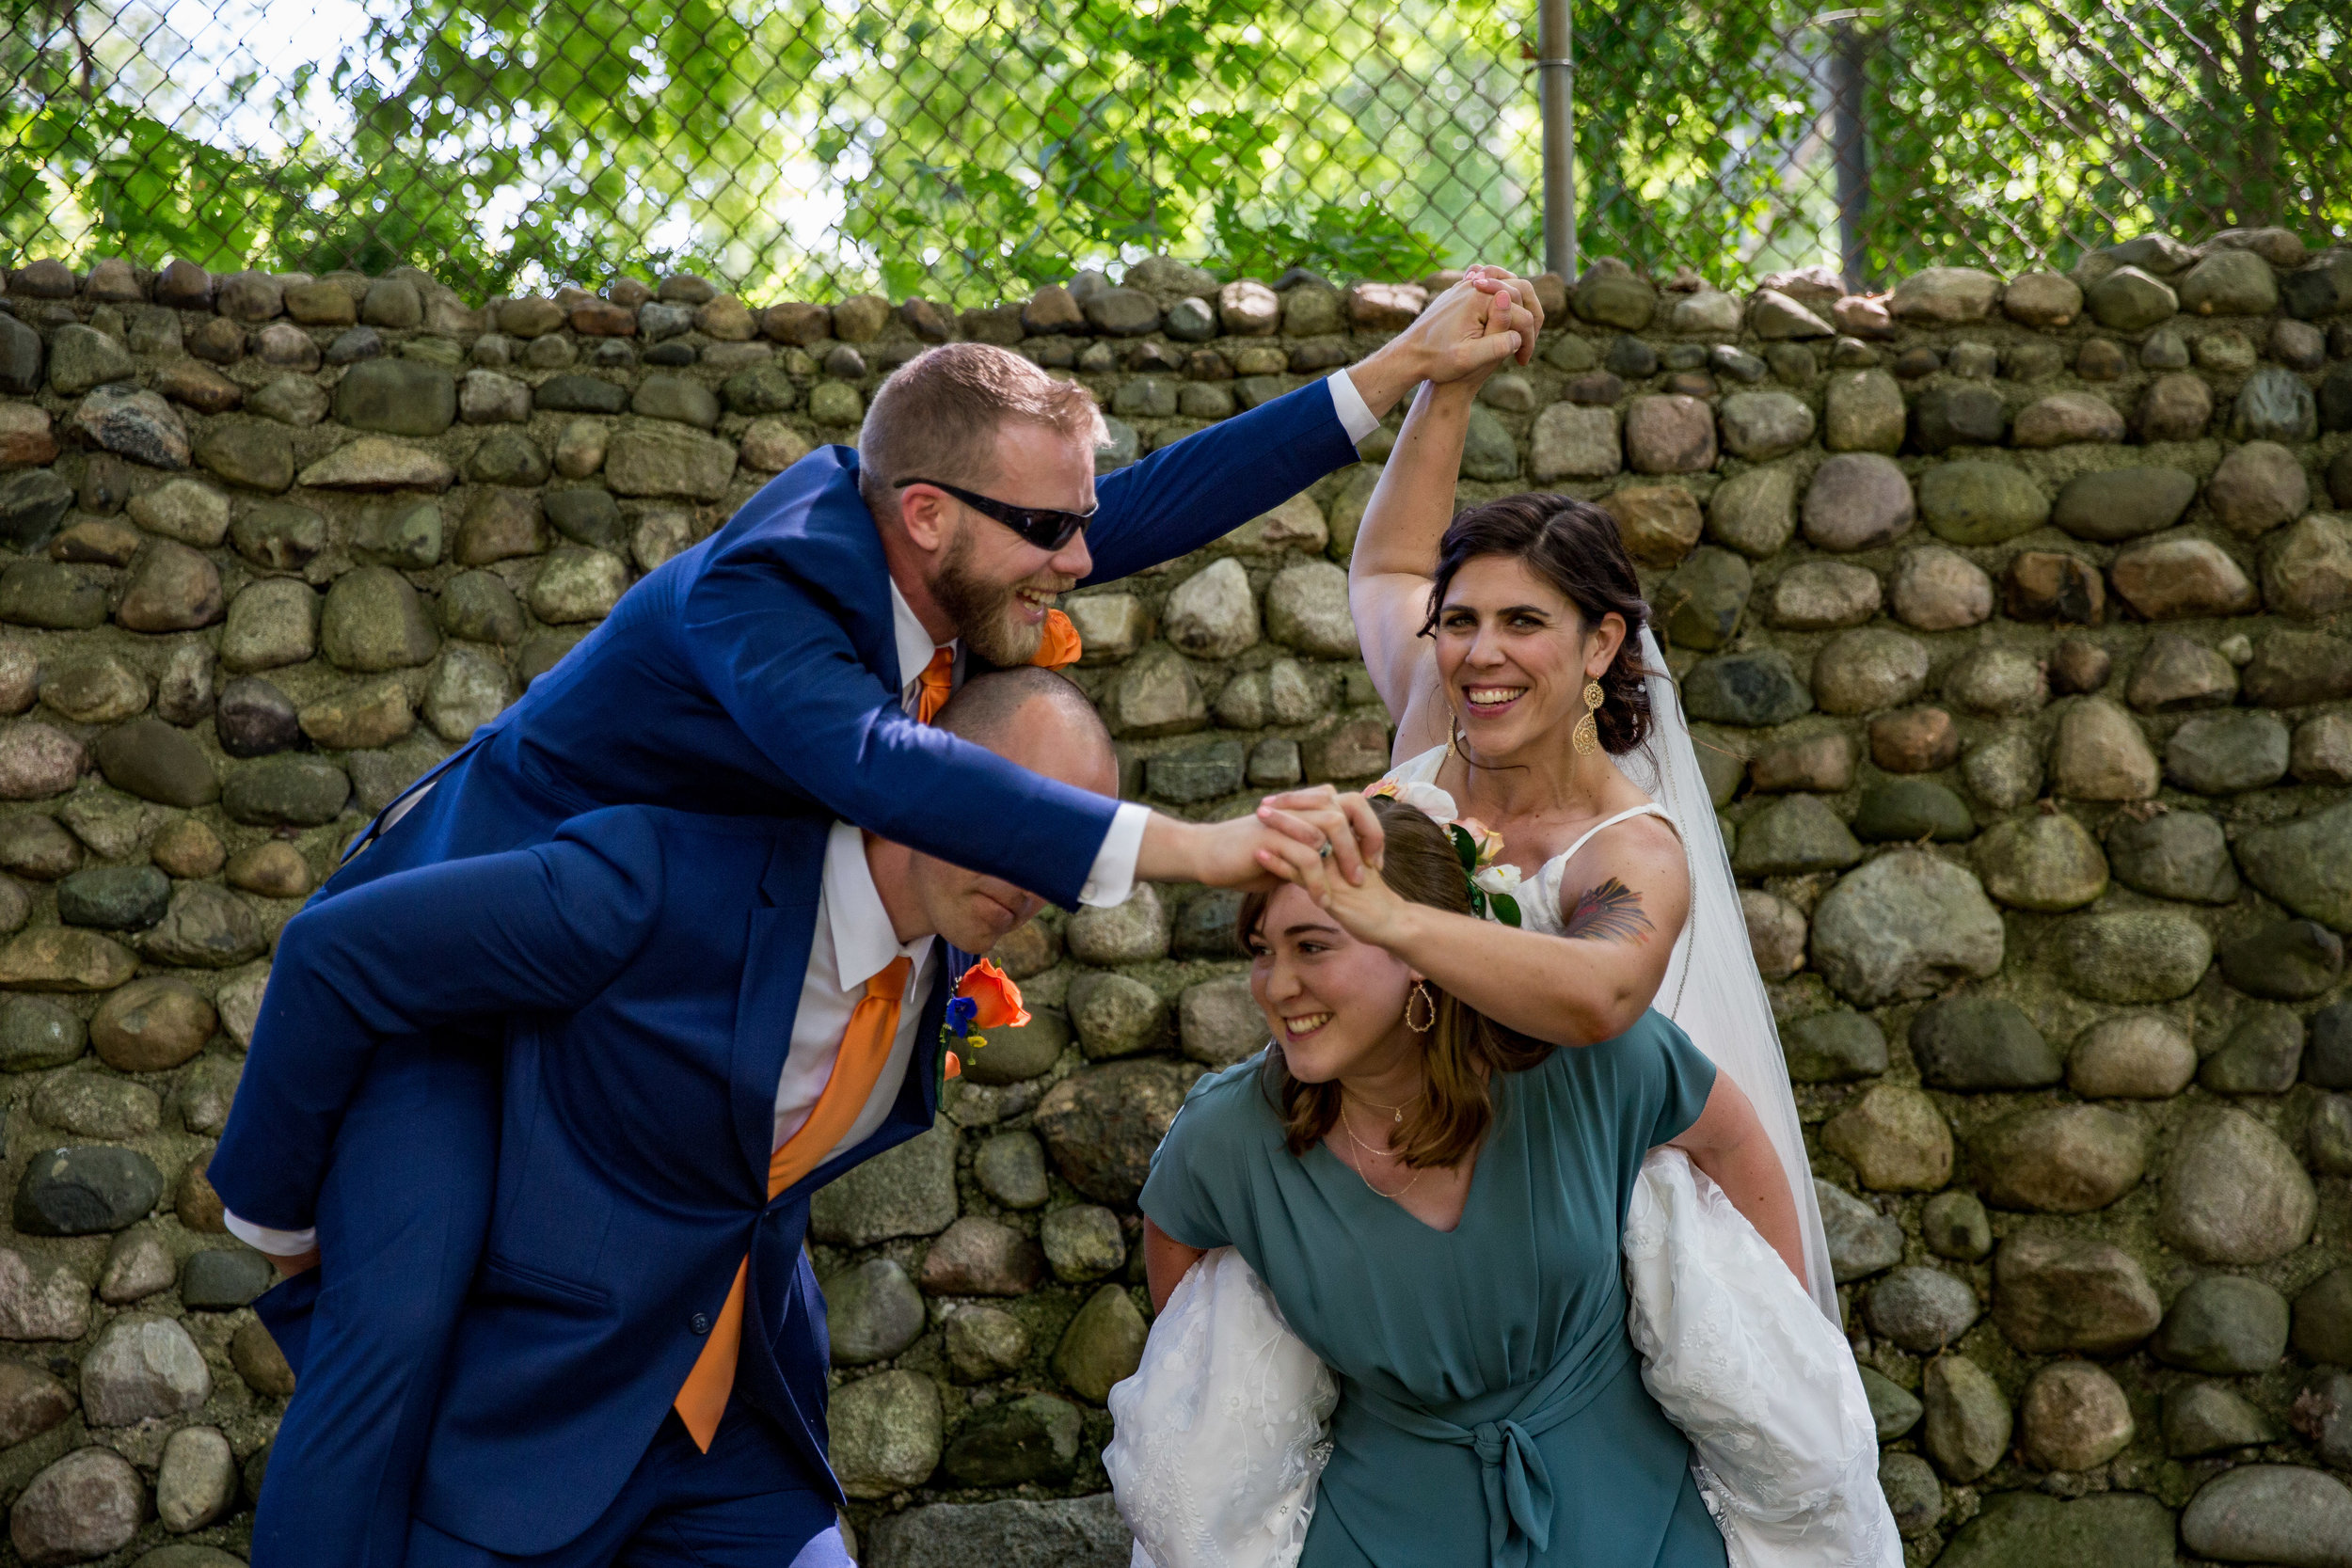 Natalie and Dallas Mooney Wedding 6-8-19_Tania Watt Photography-366.jpg